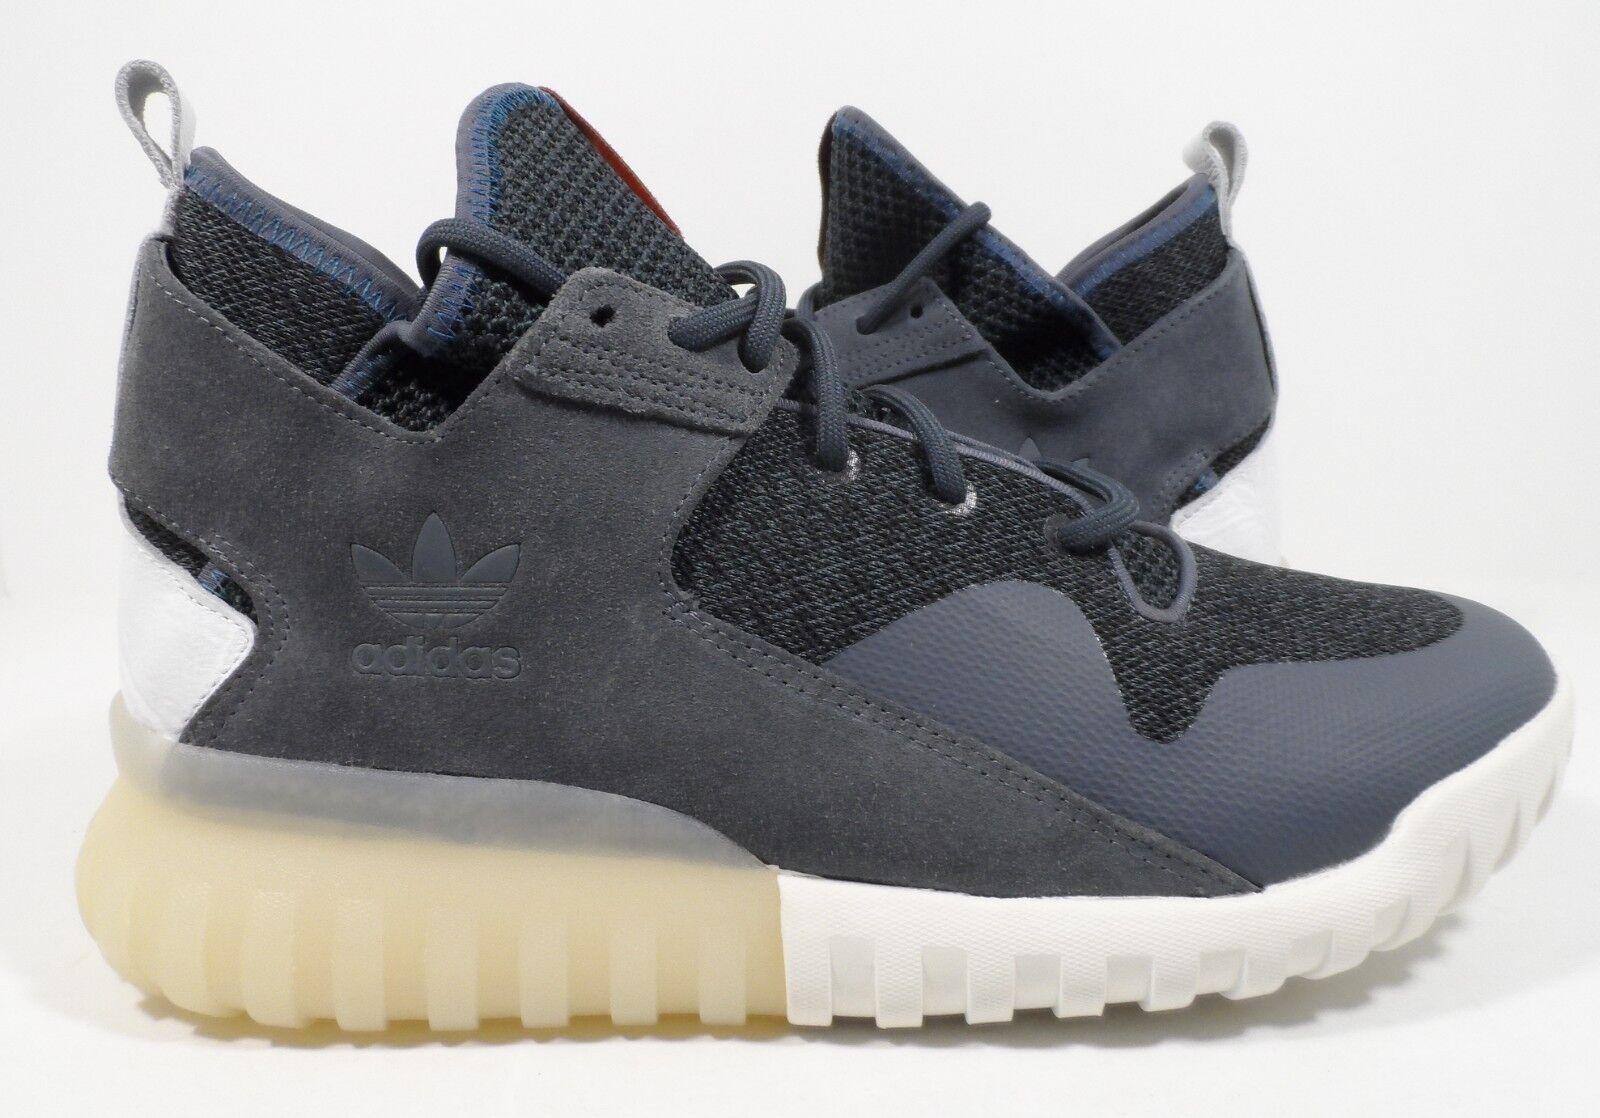 Adidas Originals Men's Tubular X Originals Basketball shoes Boonix White Size 10